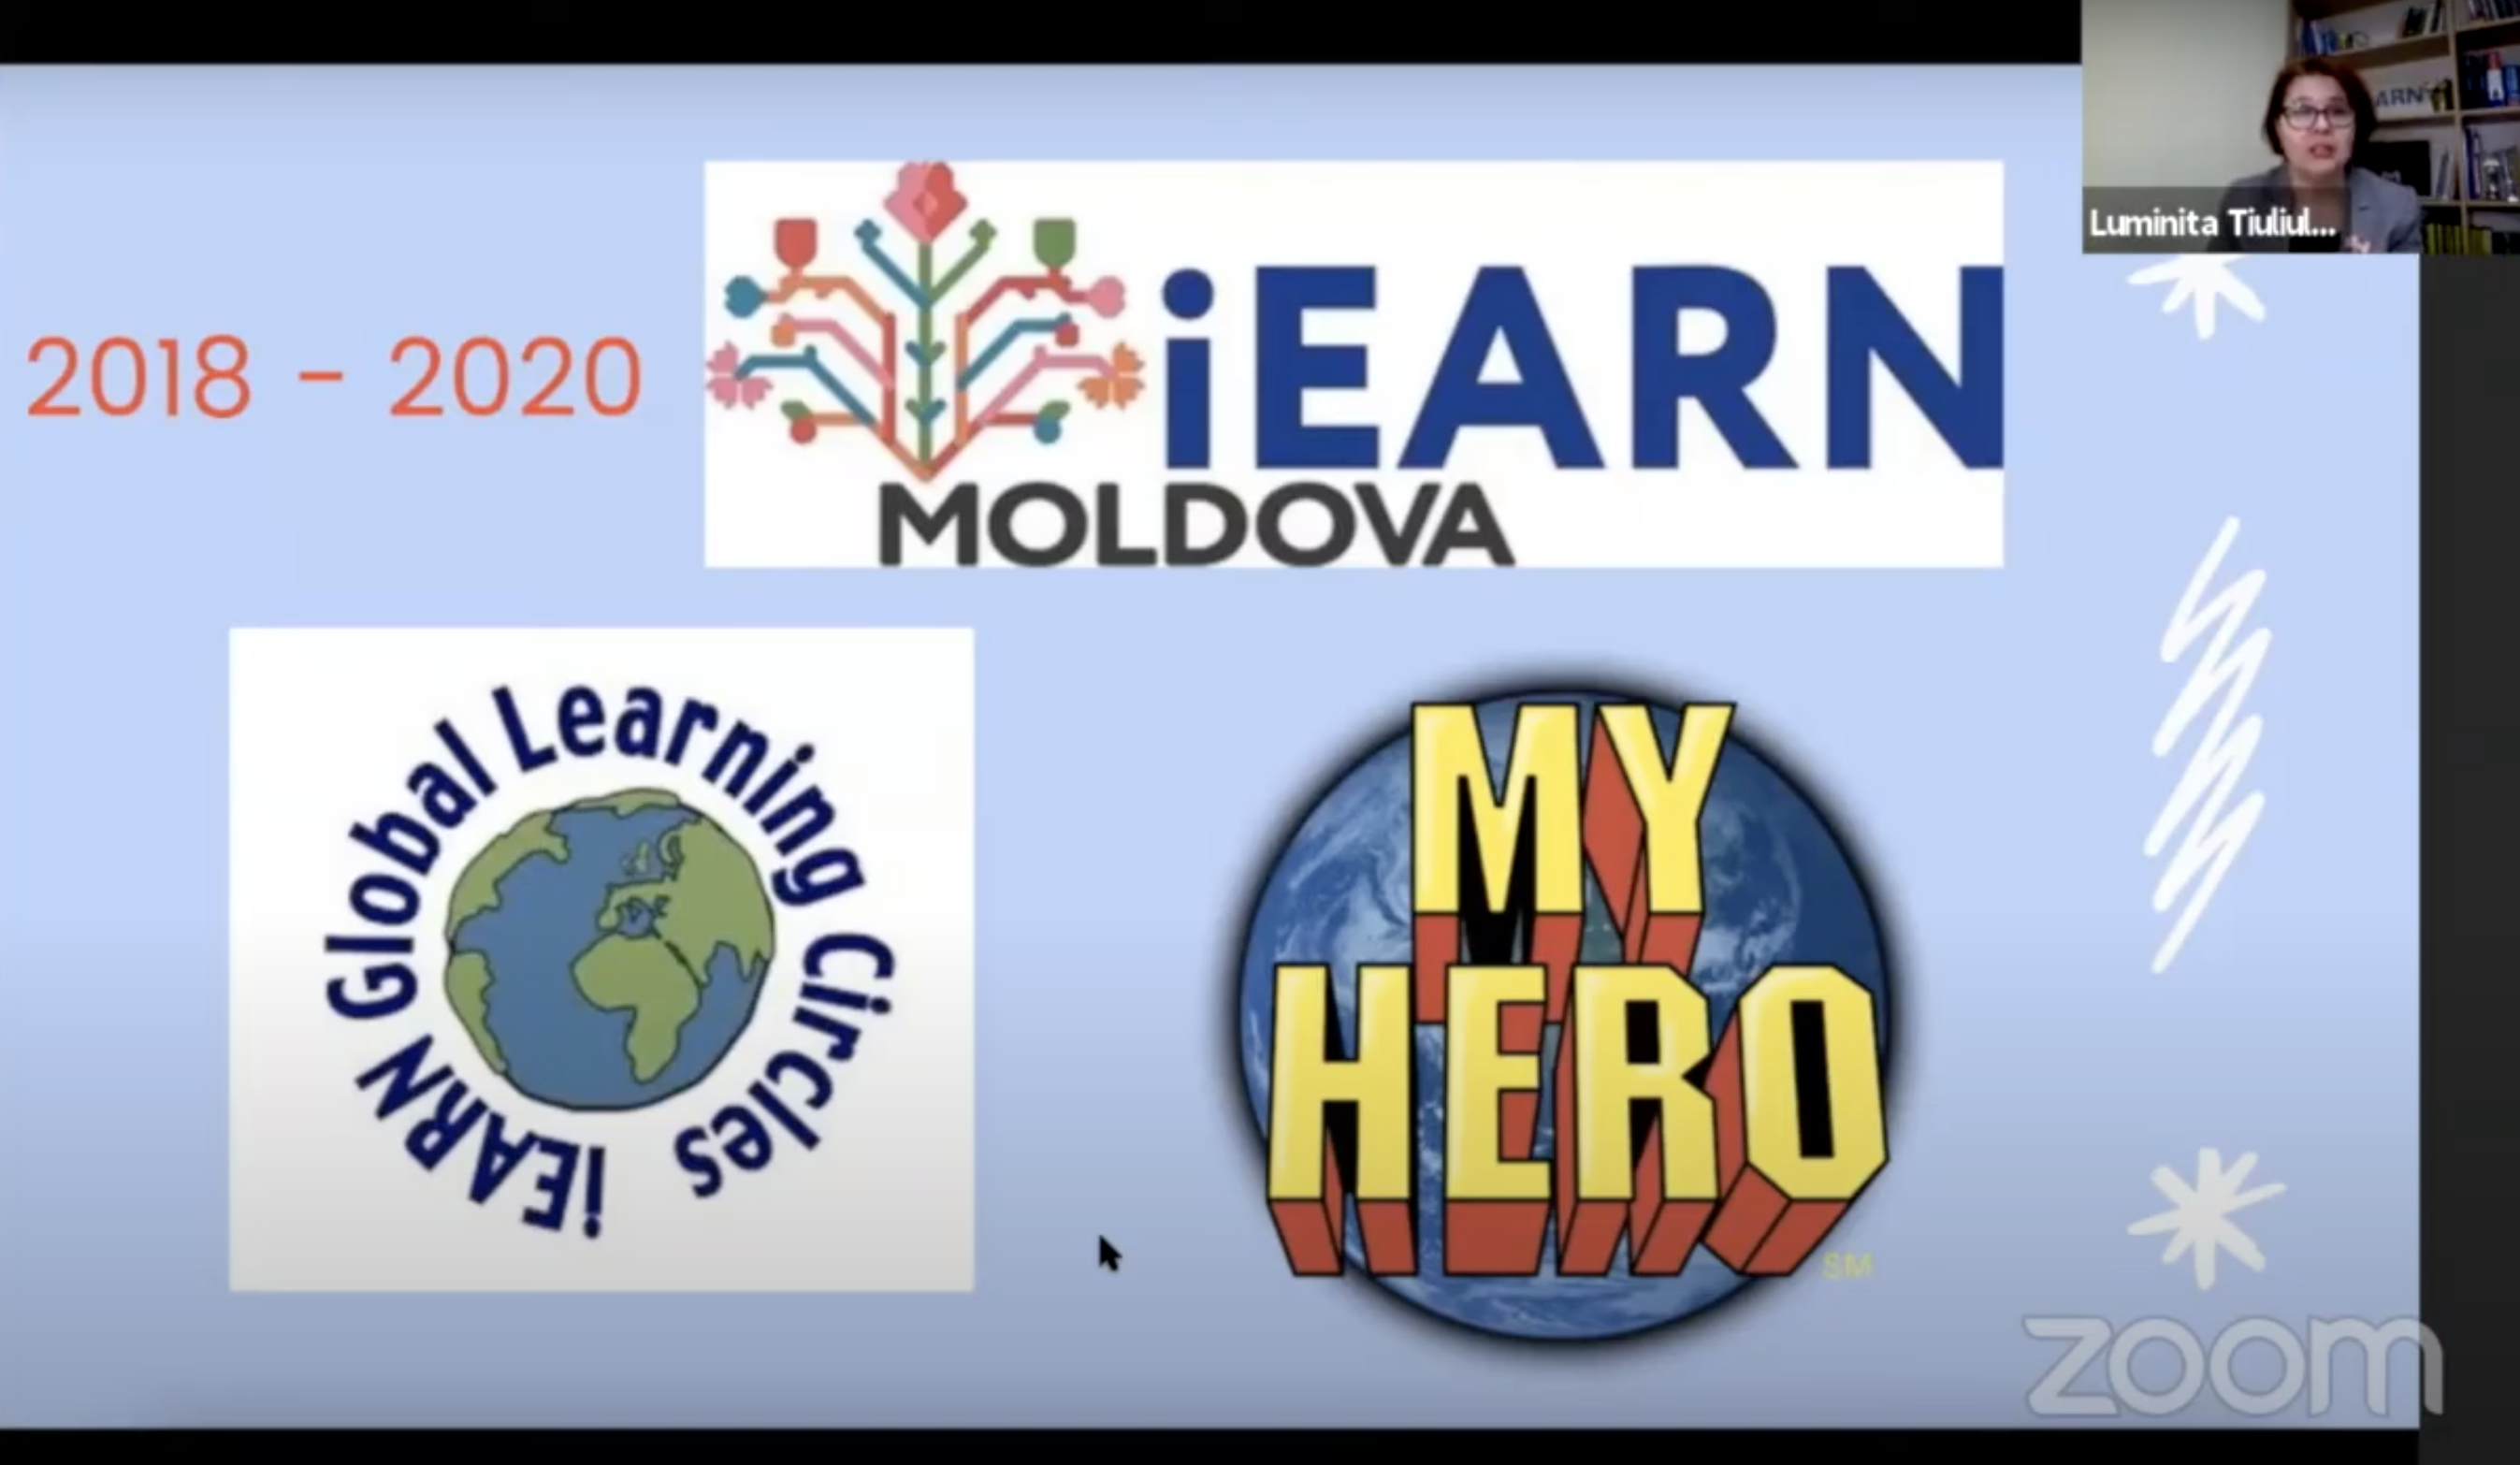 My Hero Moldova